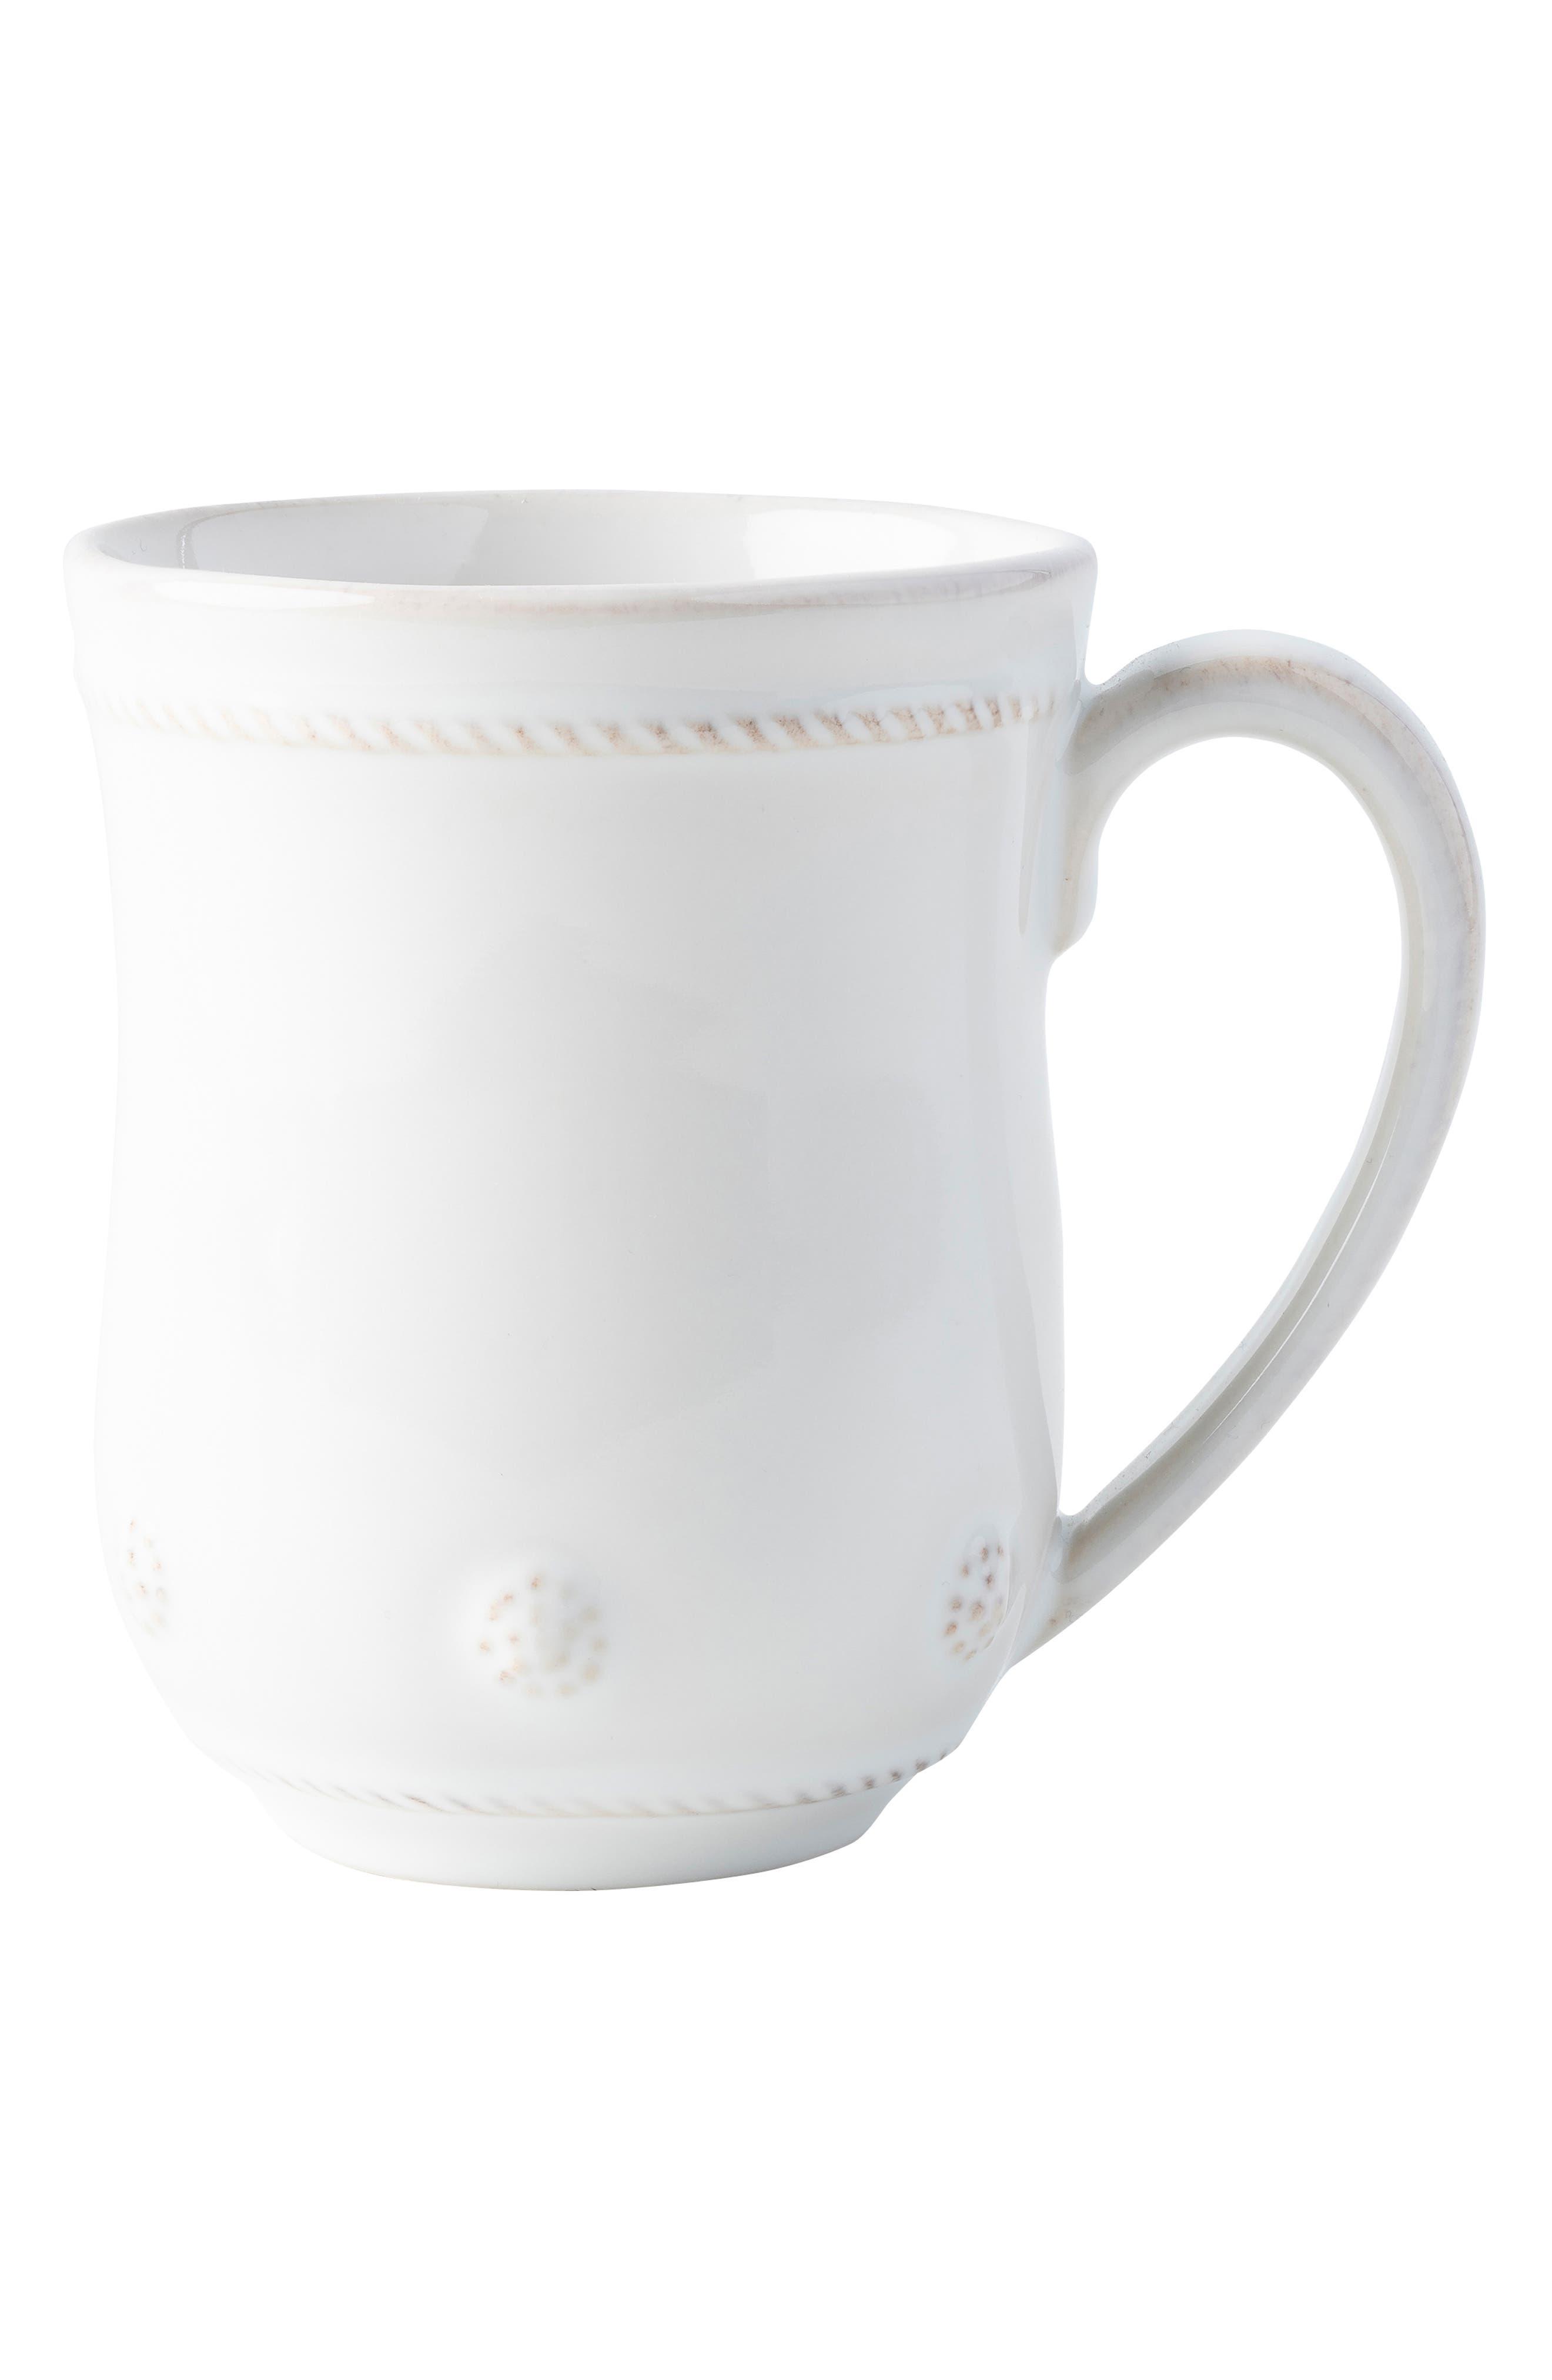 Juliska Berry And Thread Mug Size One Size  White